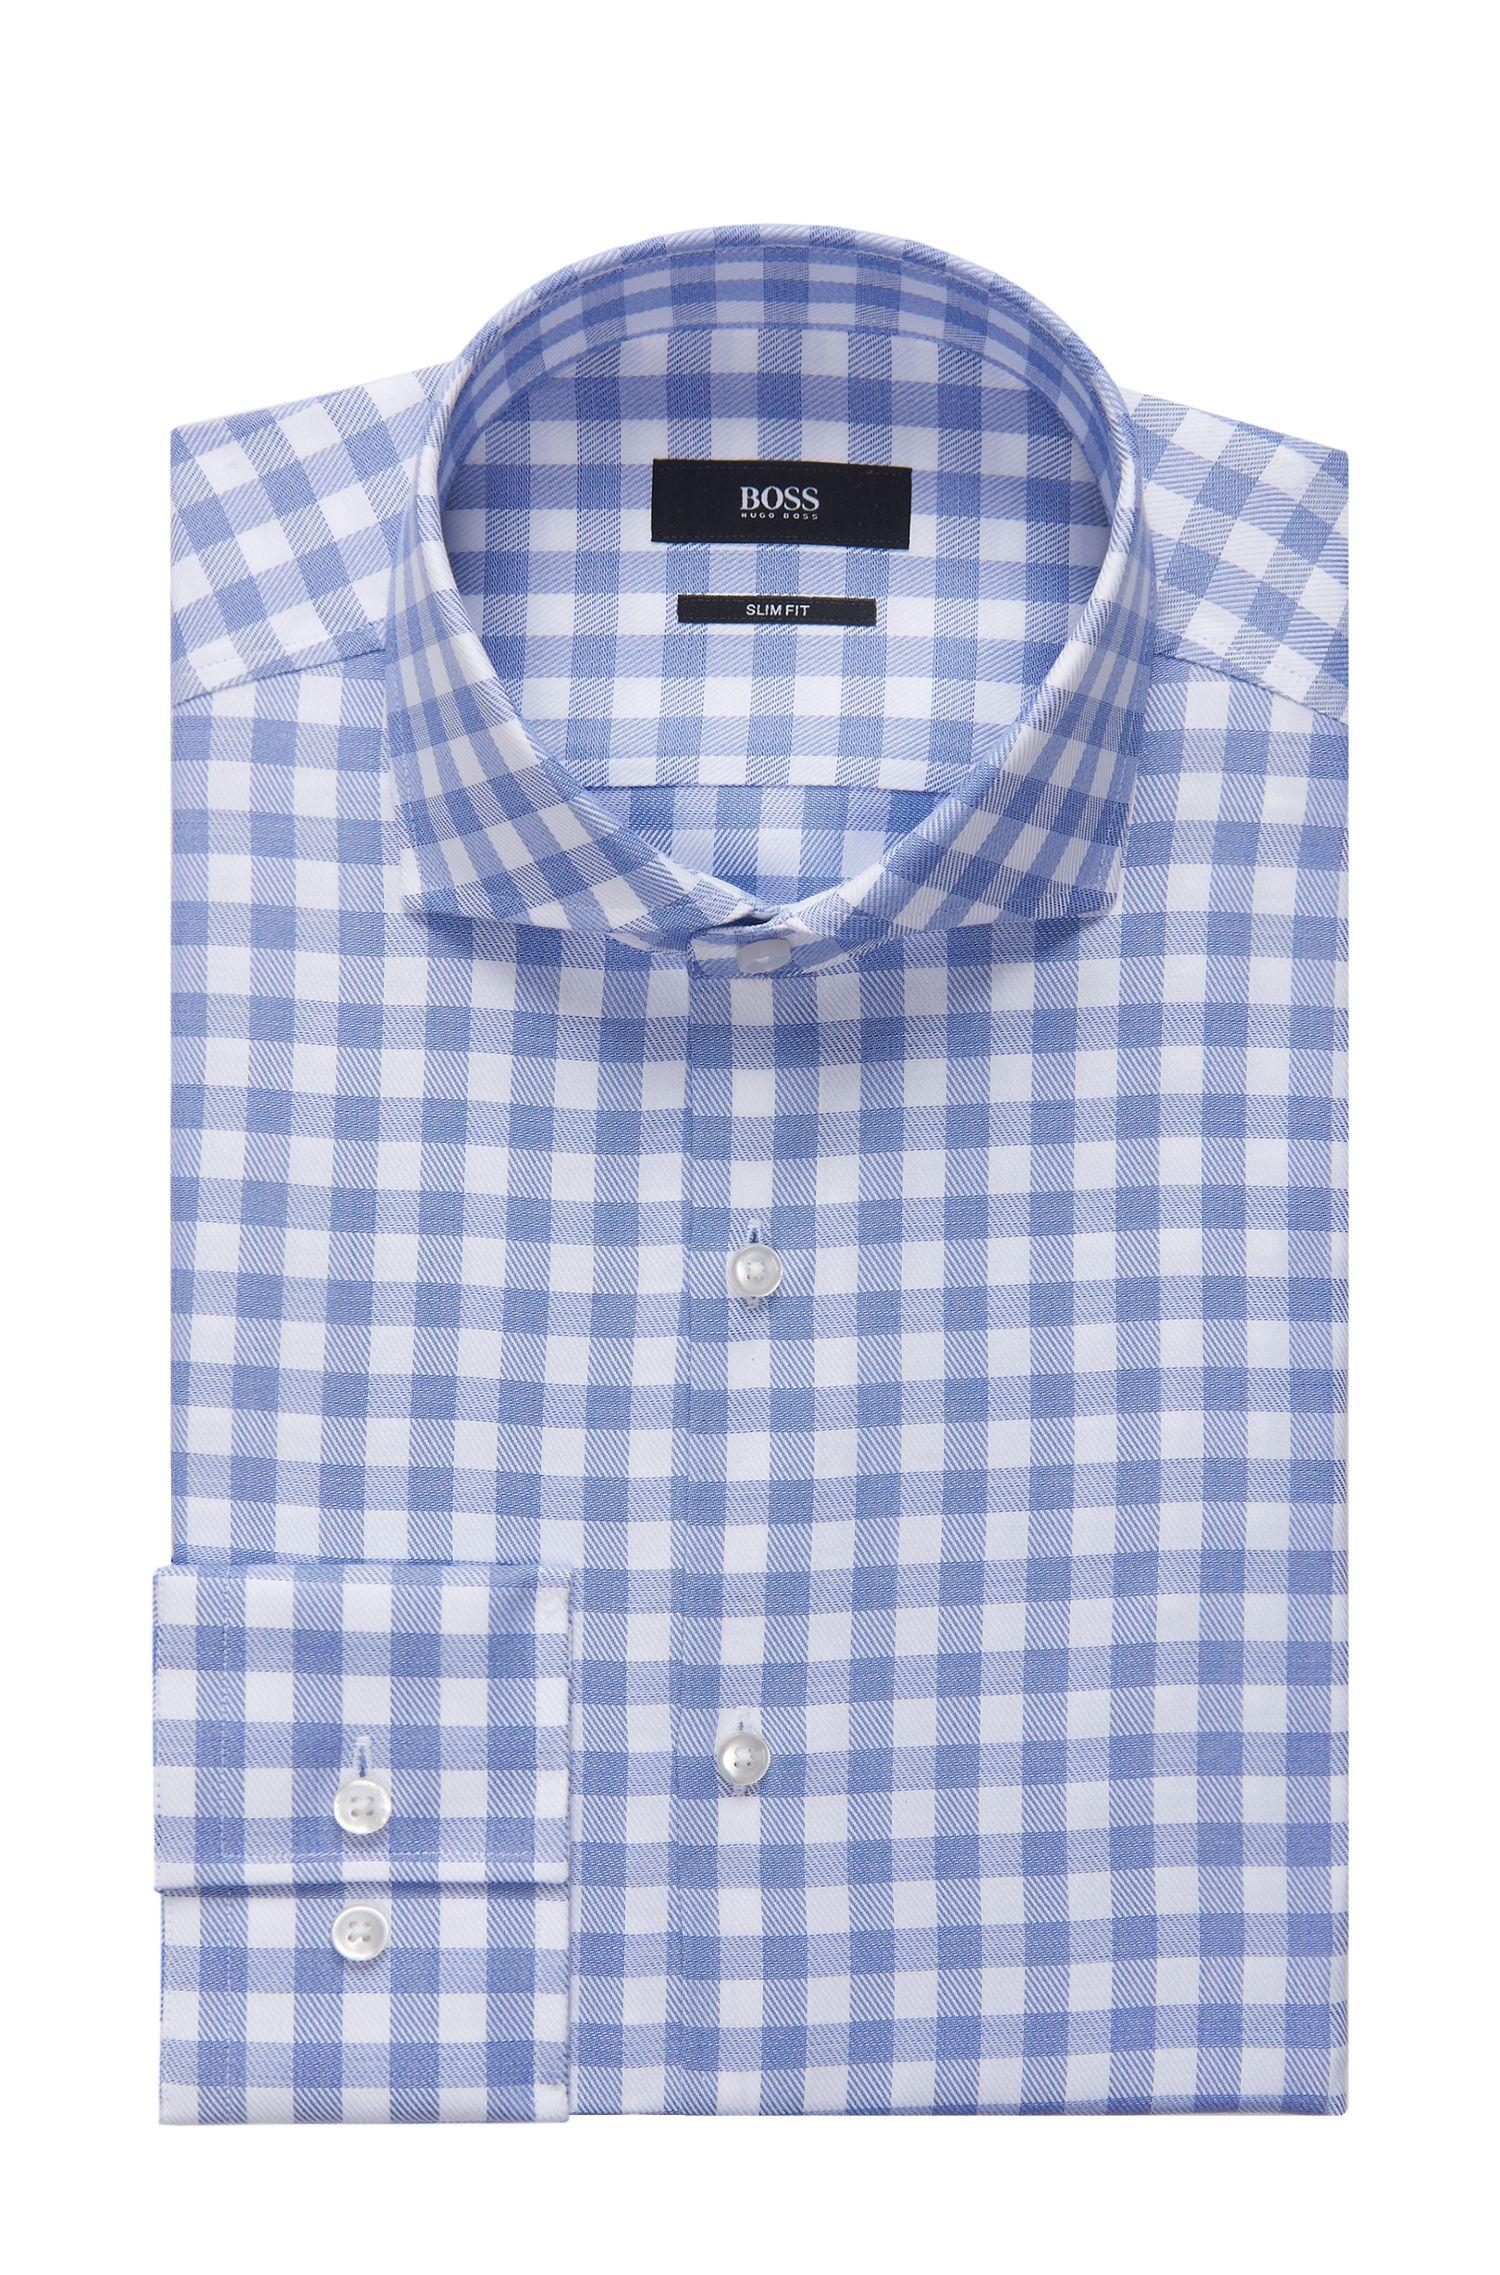 Sheperd's Check Cotton Dress Shirt, Slim Fit   Jason